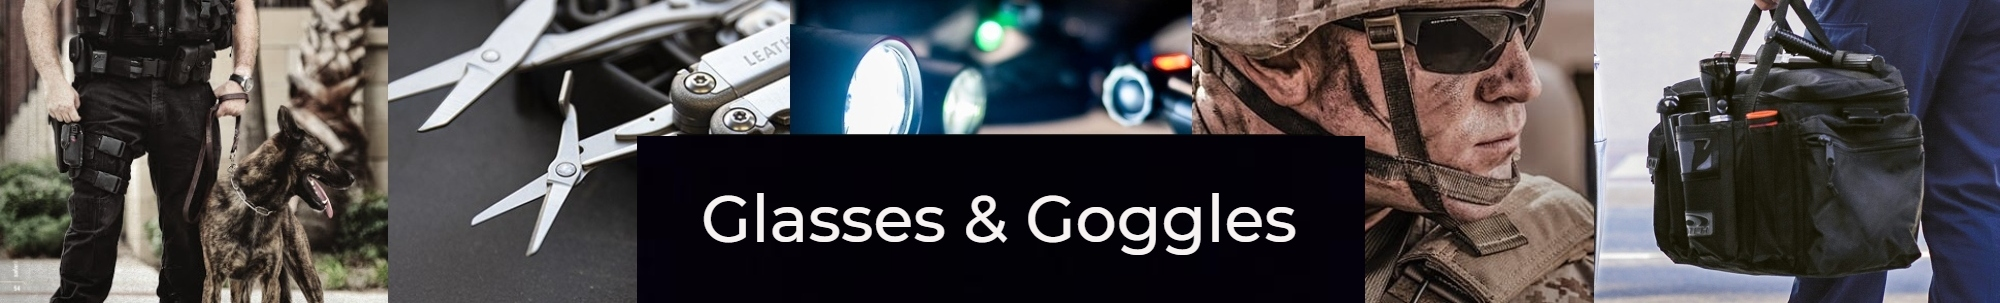 Equipment-goggles.jpg